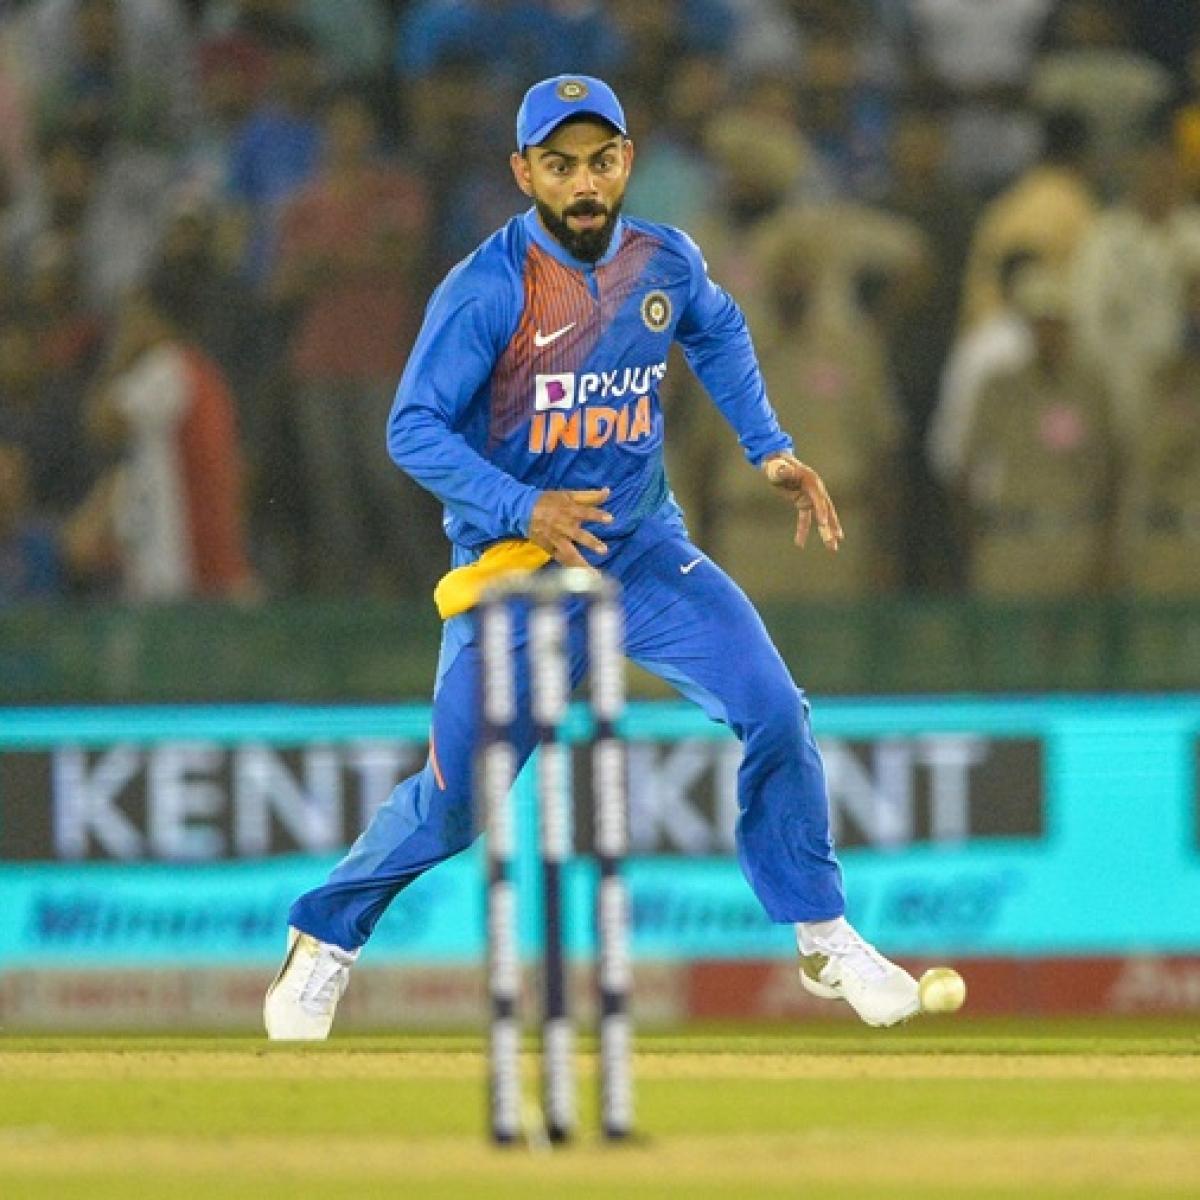 India vs South Africa: Virat Kohli breaks stumps in frustration, watch video